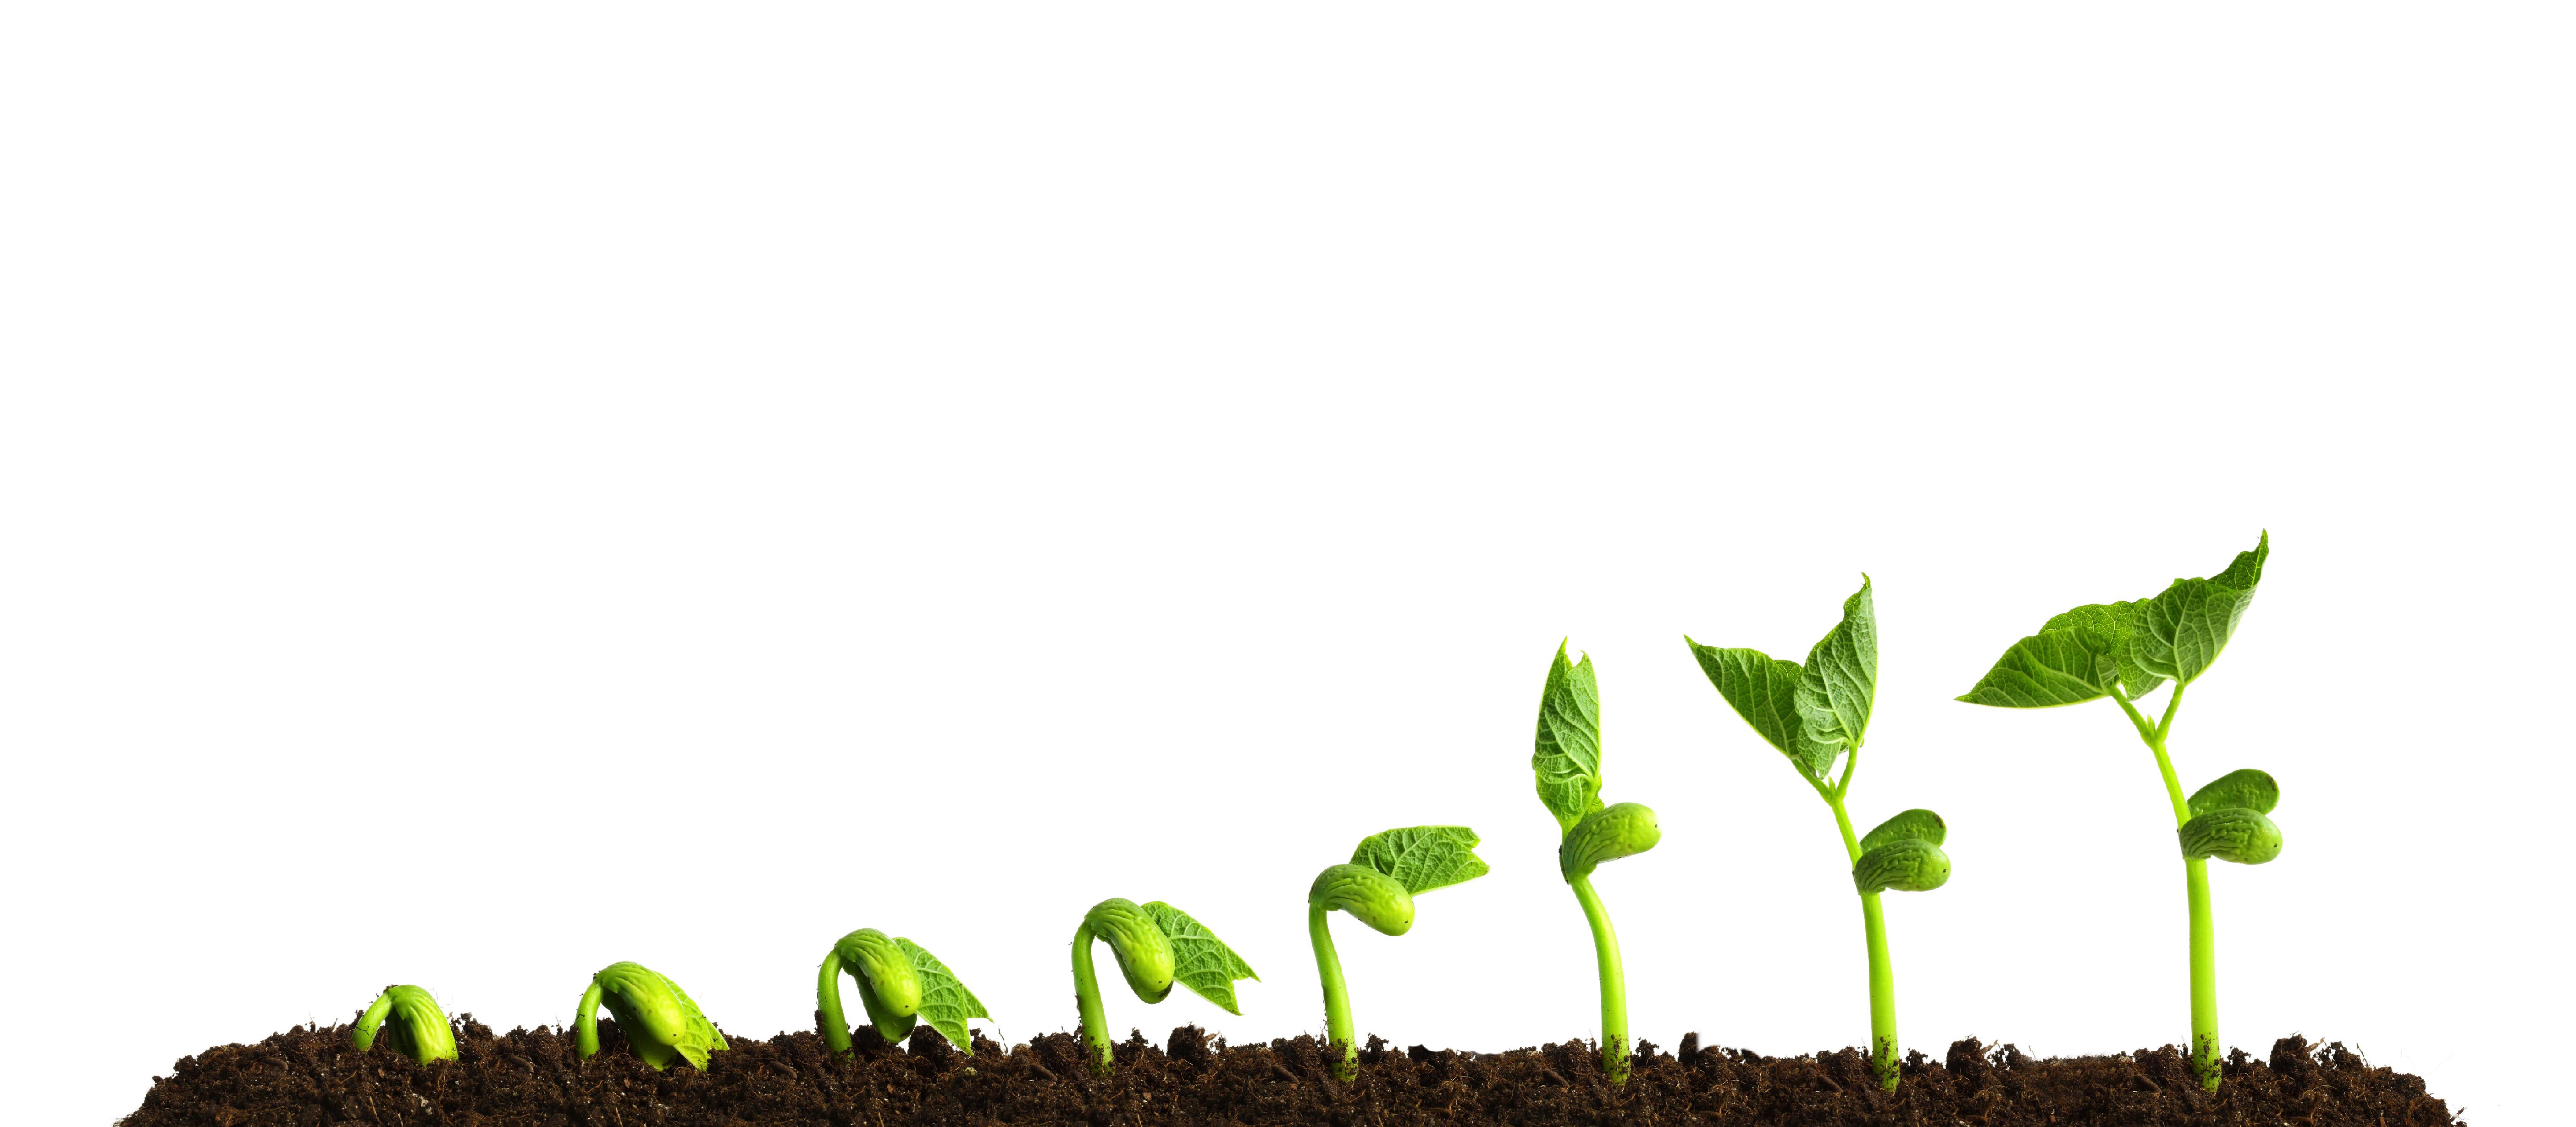 plant growing v2 - Mentio